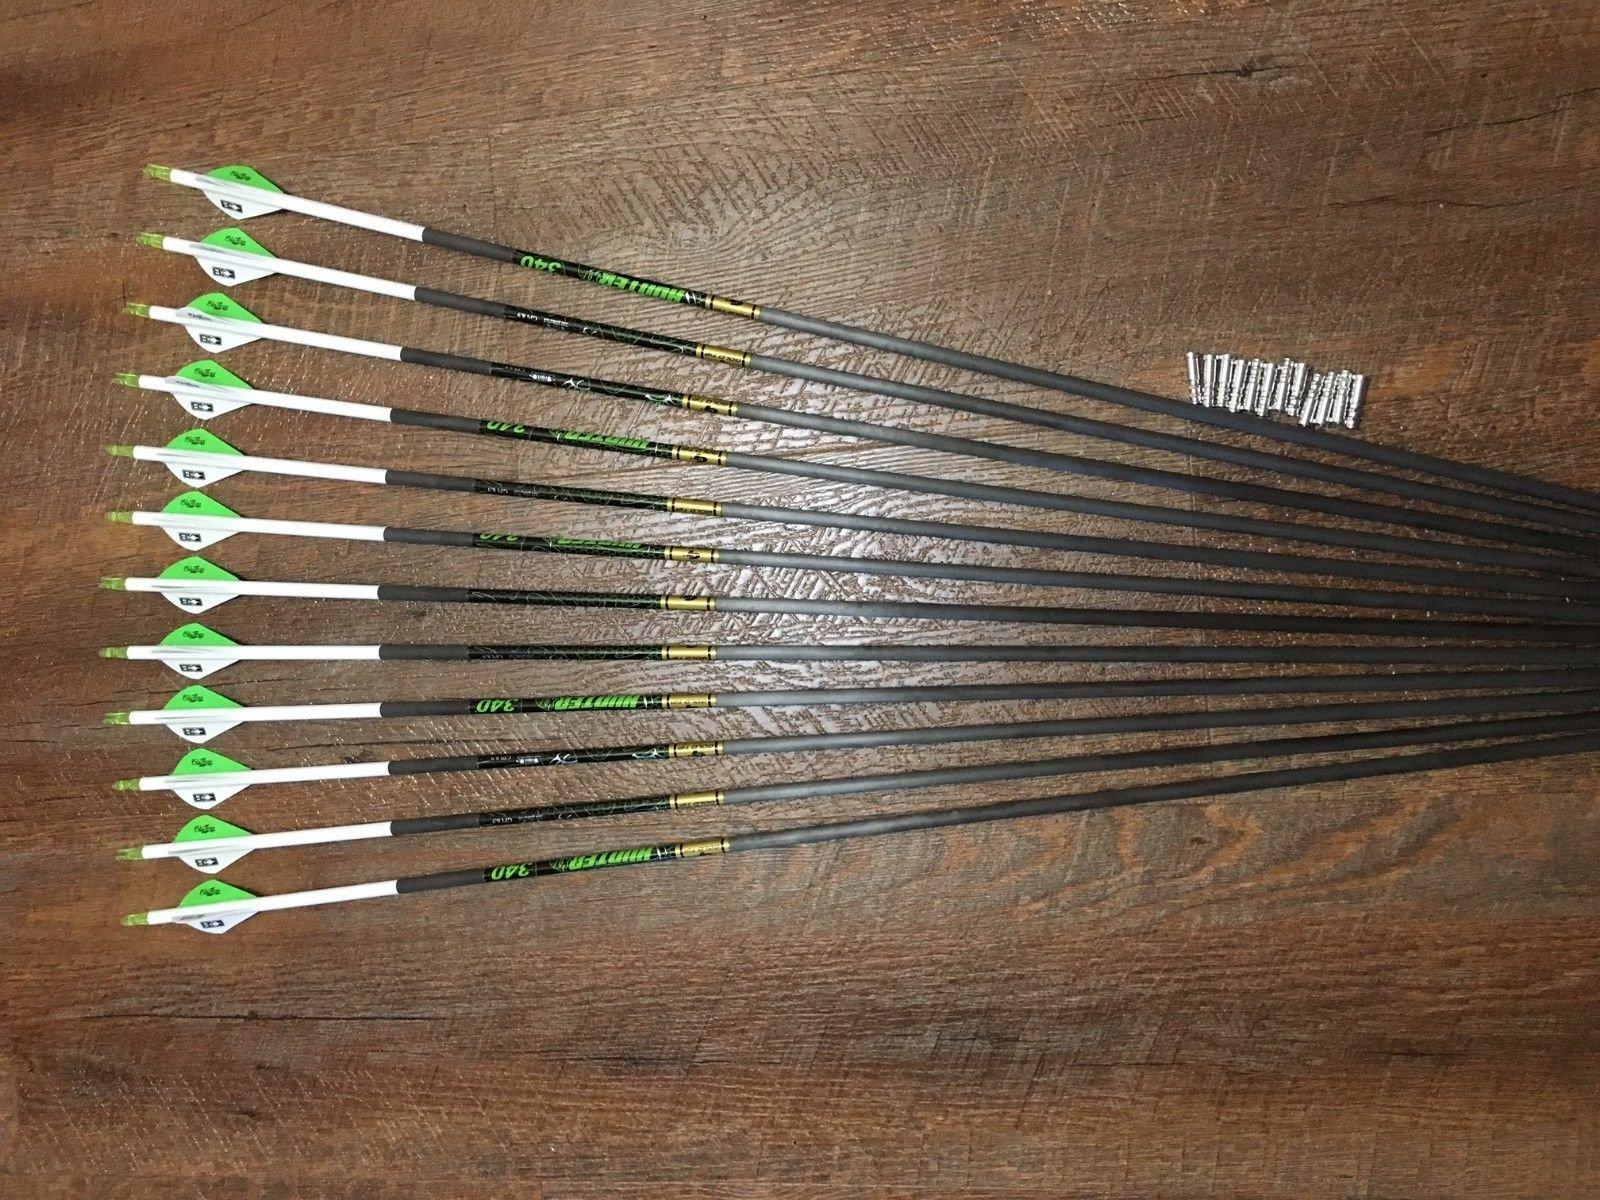 Gold Tip XT Hunter 340 Arrows with Blazer Vanes Custom Made Set of 12